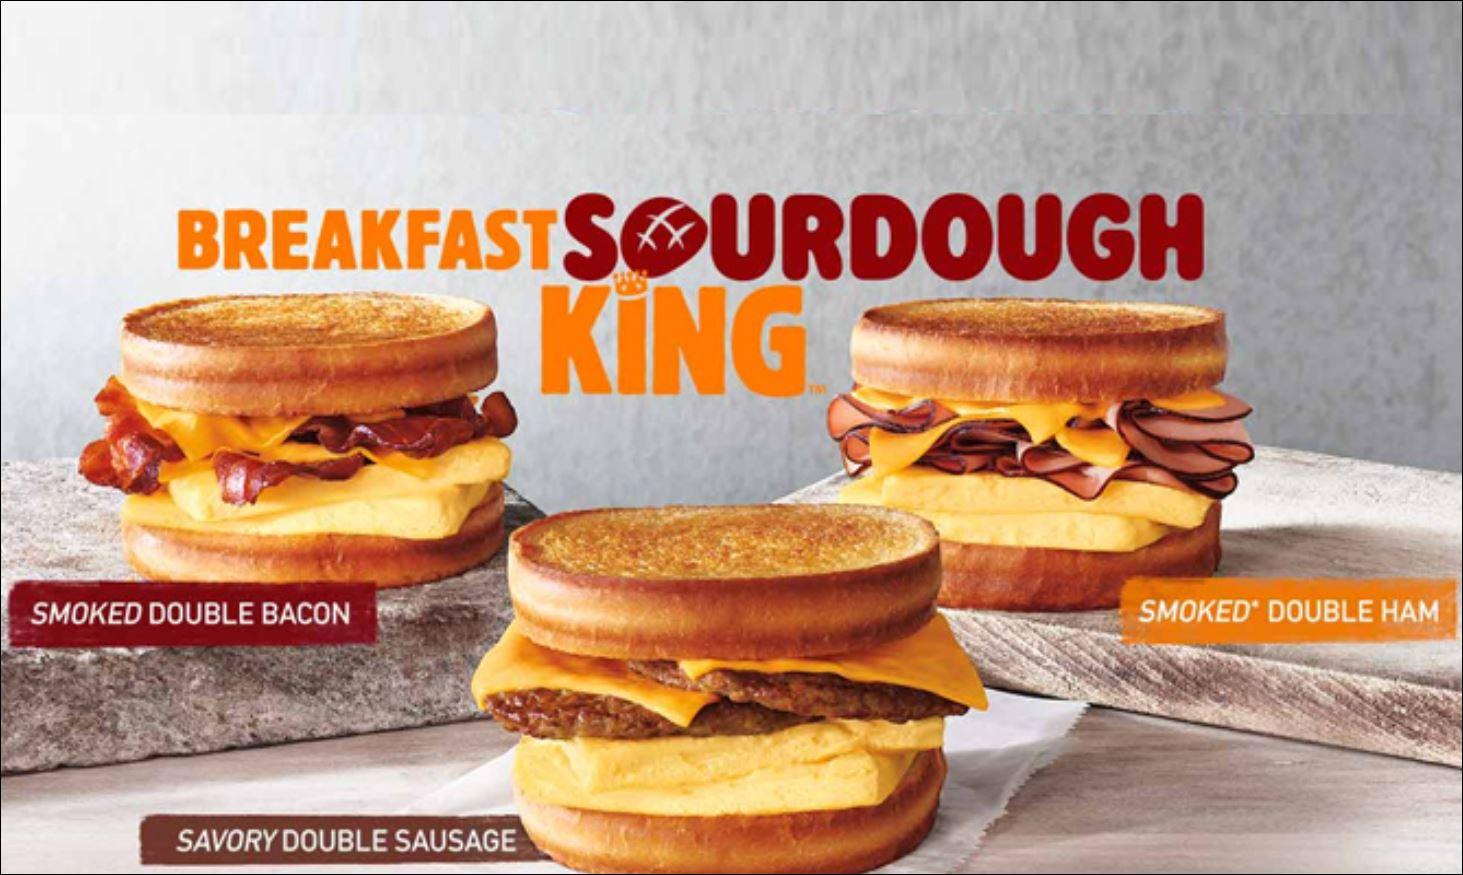 Burger King all-day breakfast menu